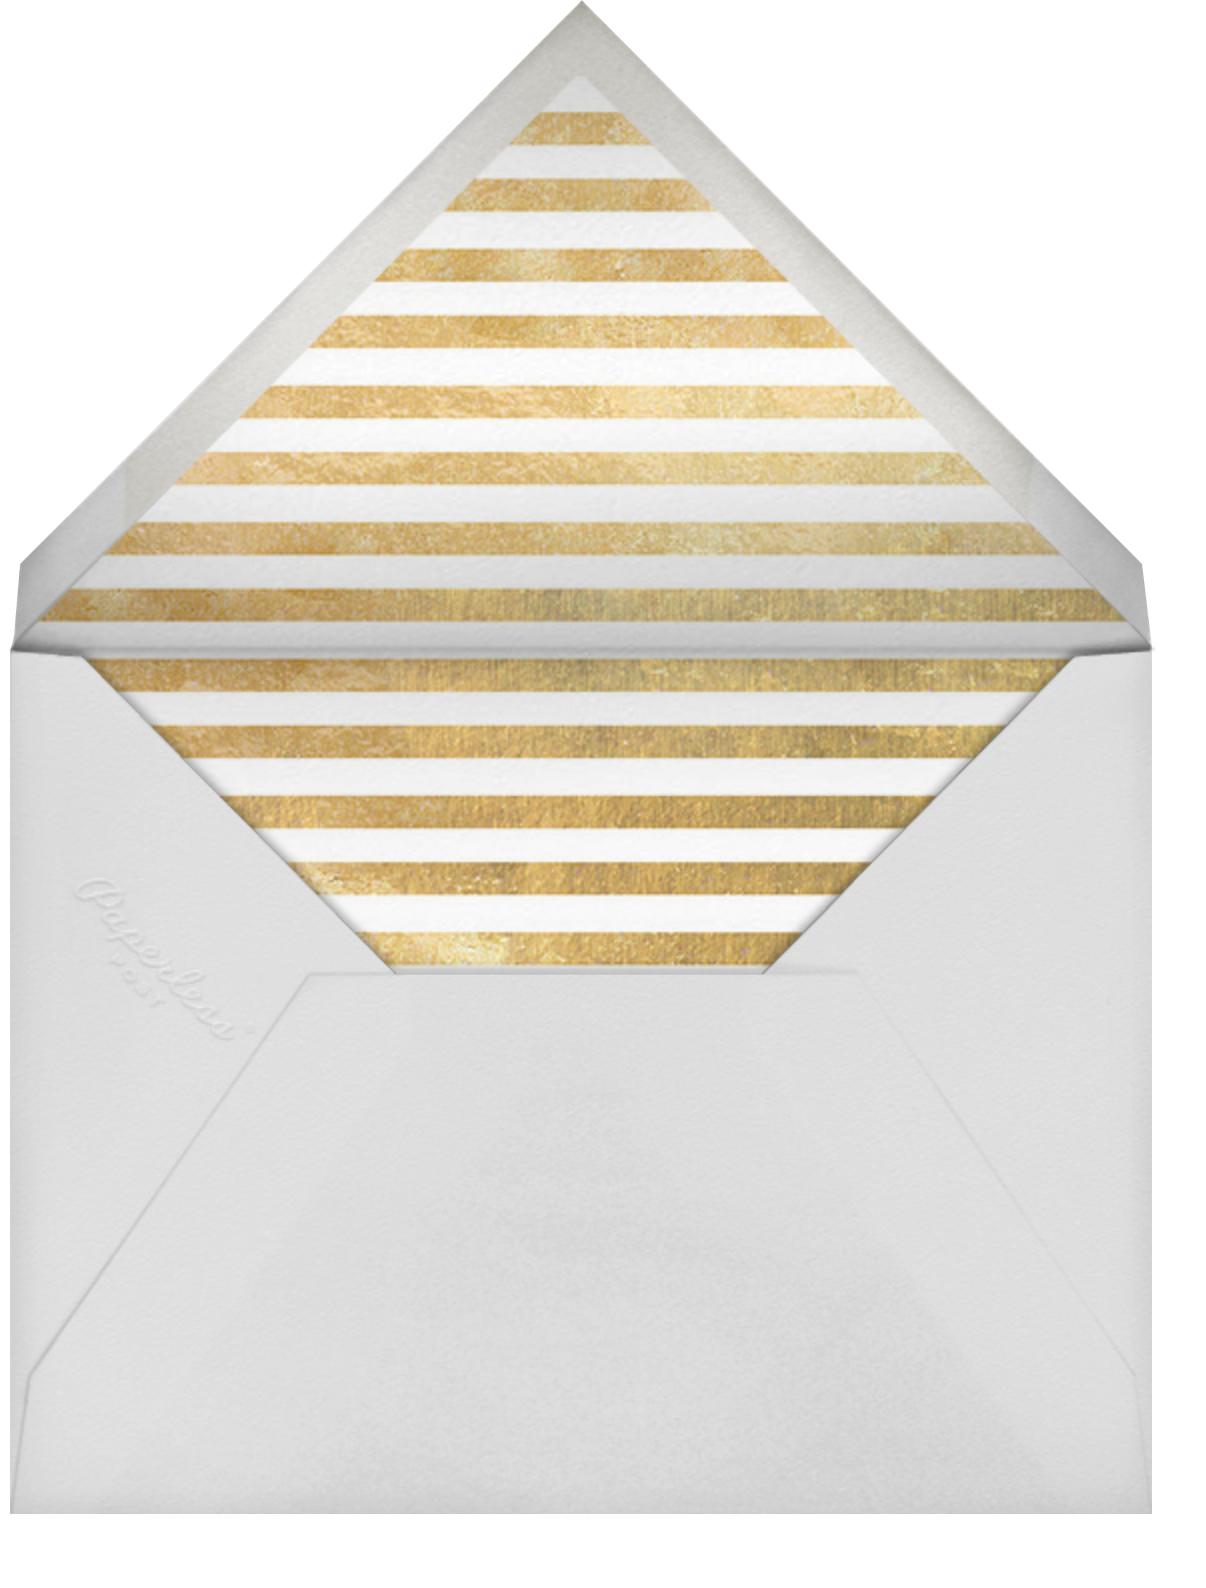 Confetti - White/Gold - kate spade new york - Graduation - envelope back